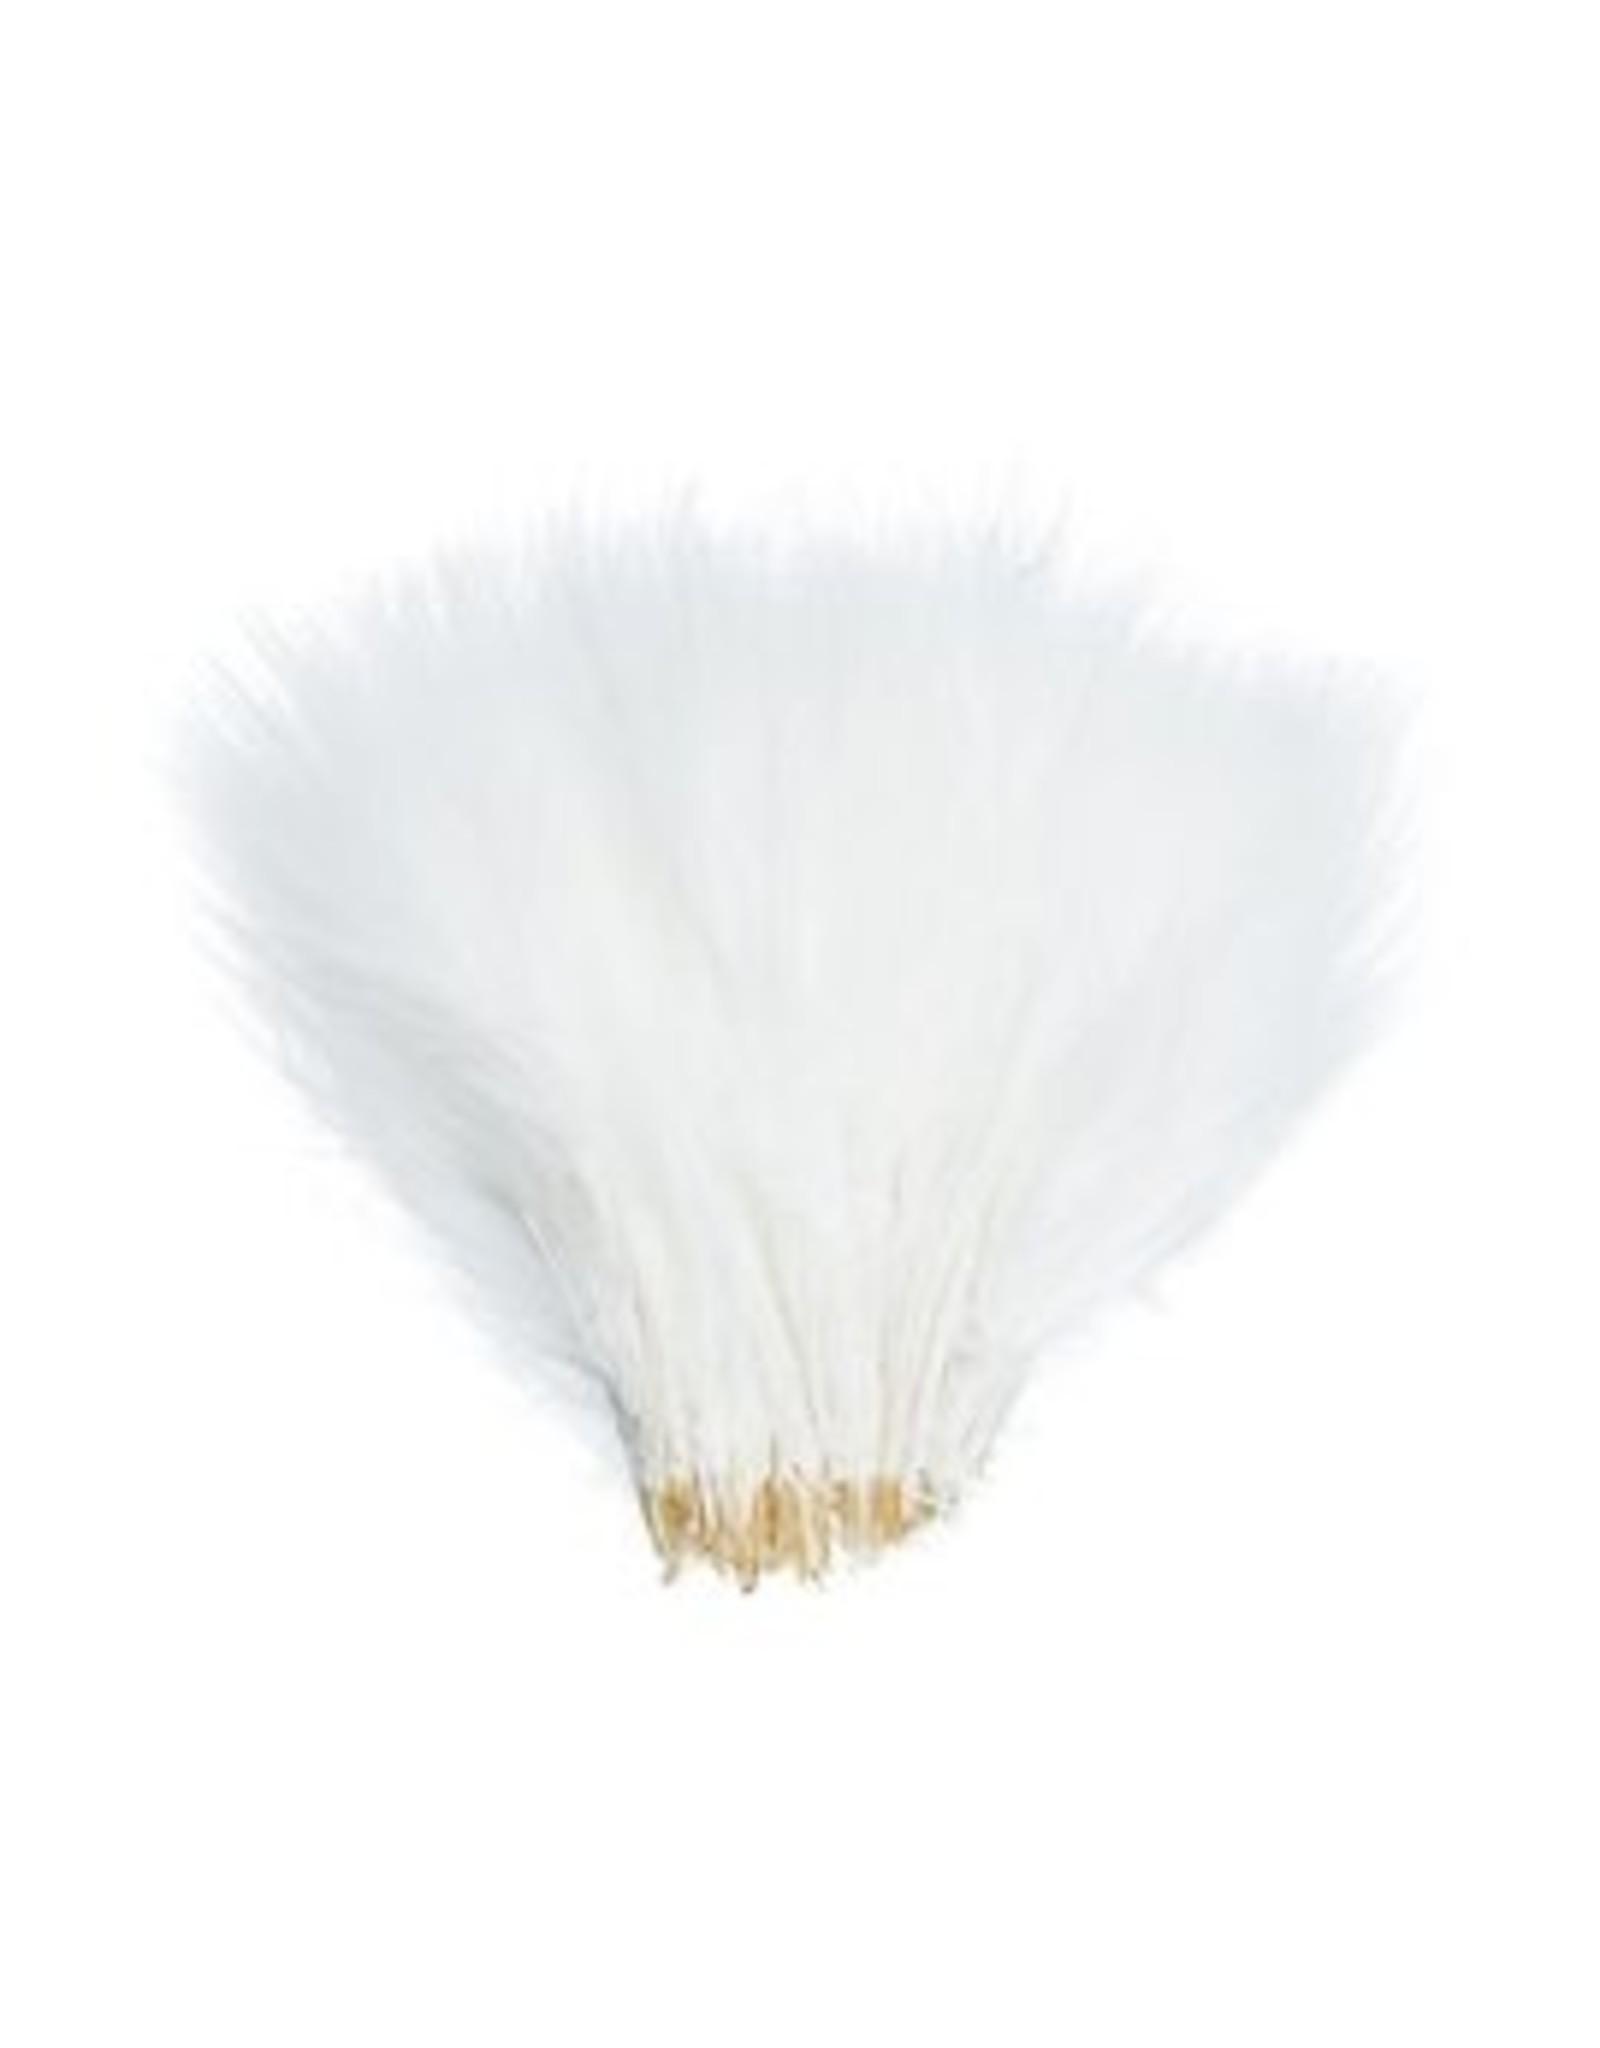 WAPSI FLY Wooly Bugger Marabou - White